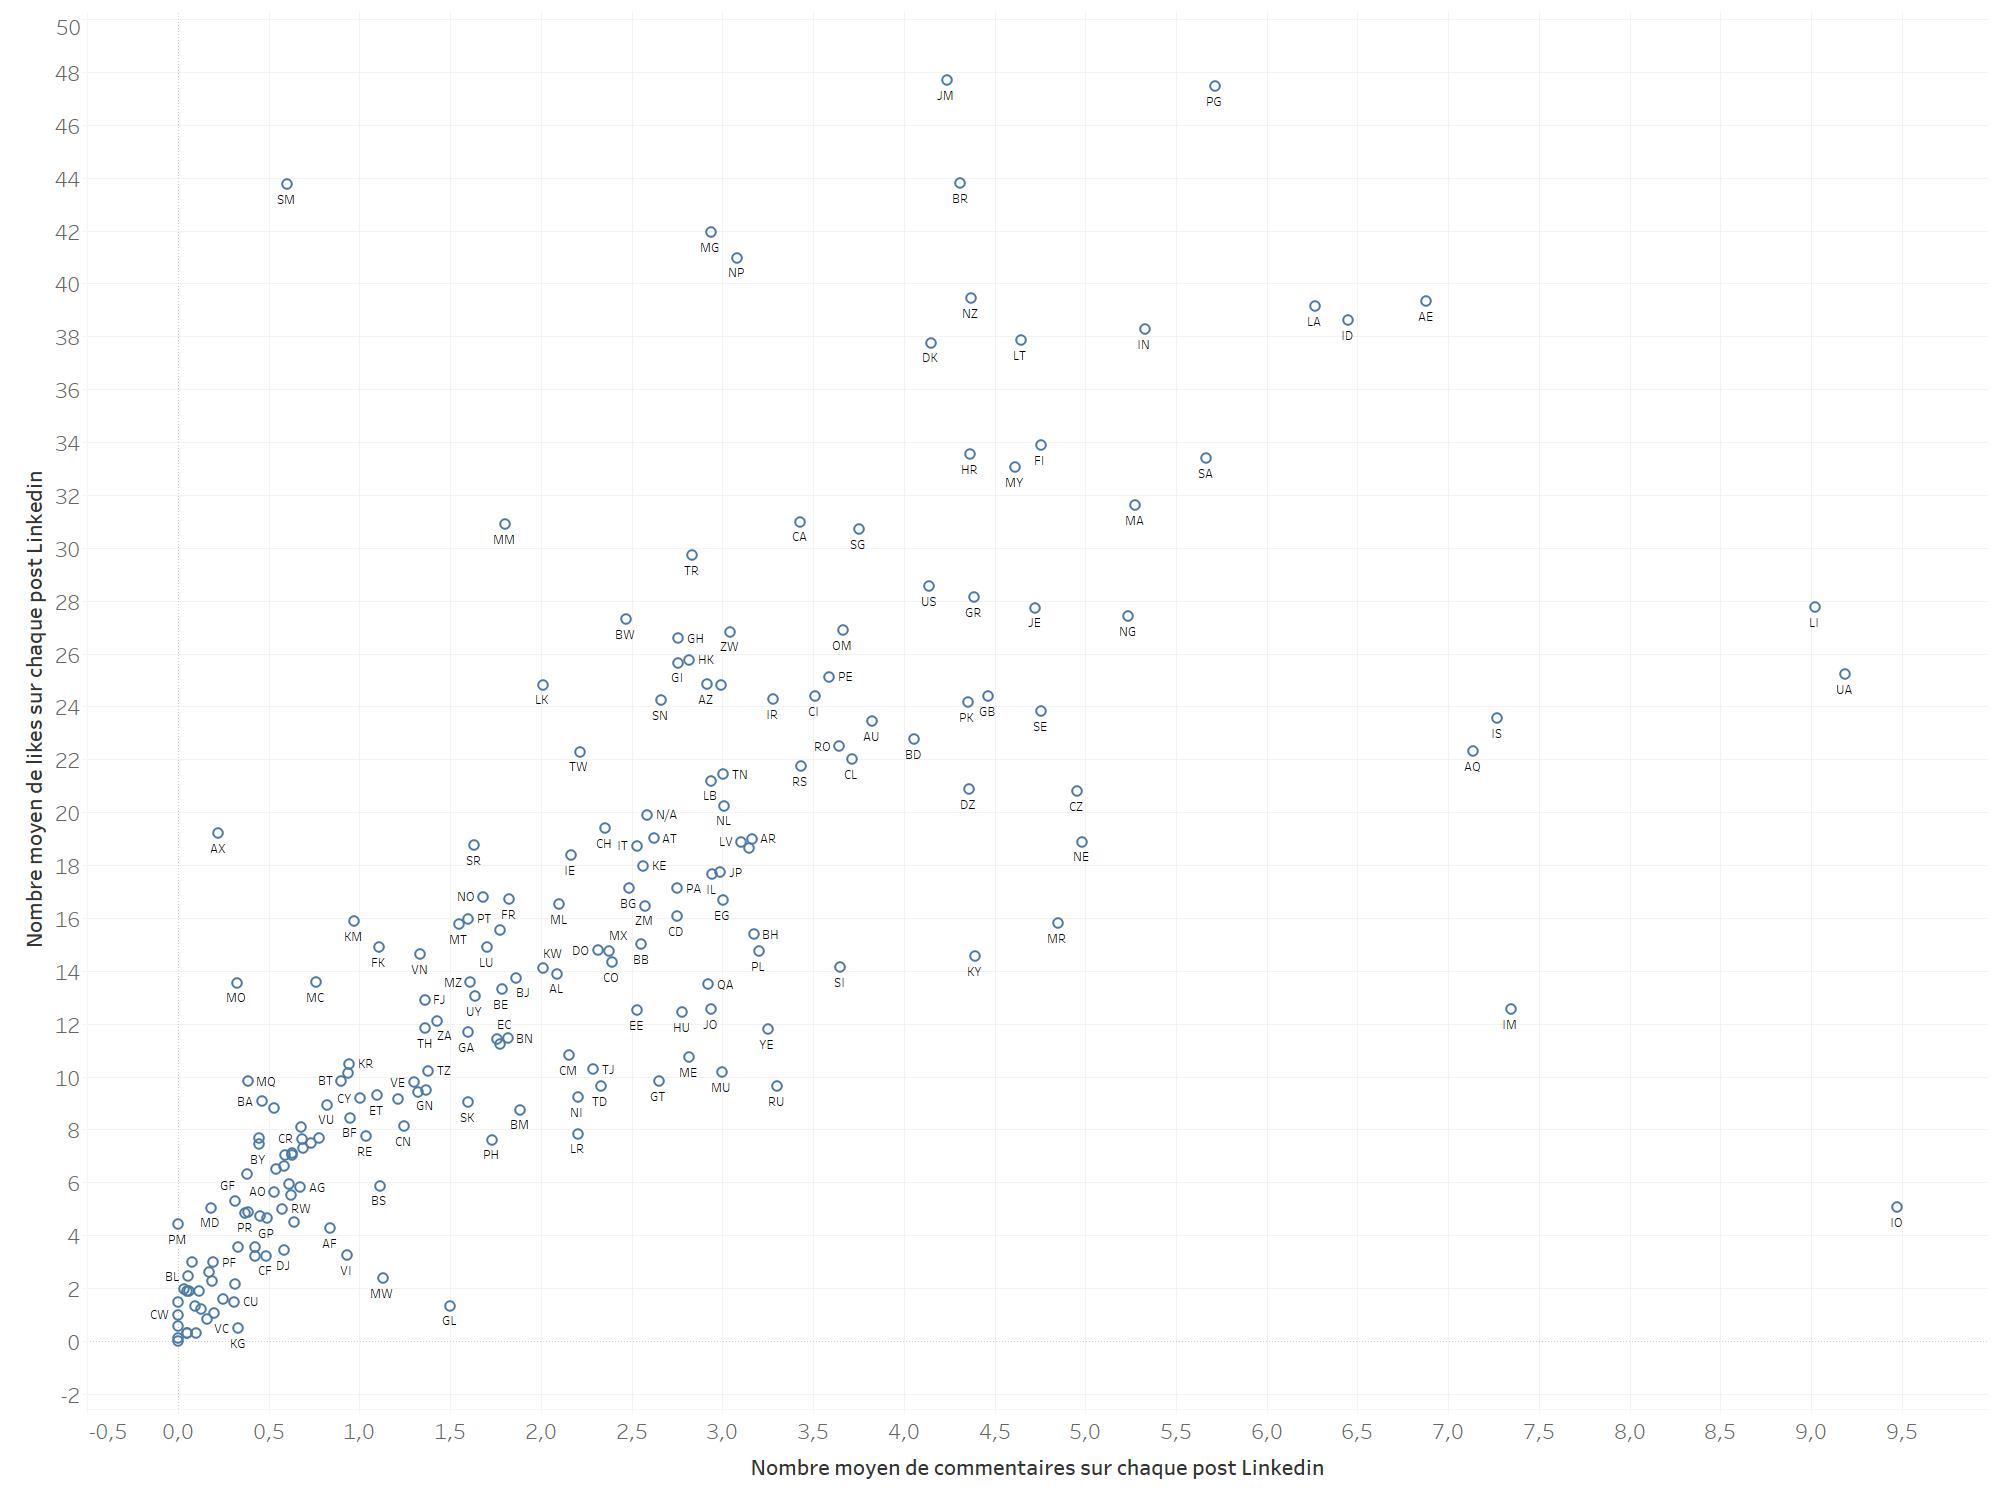 scatter plot likes commentaires linkedin par pays